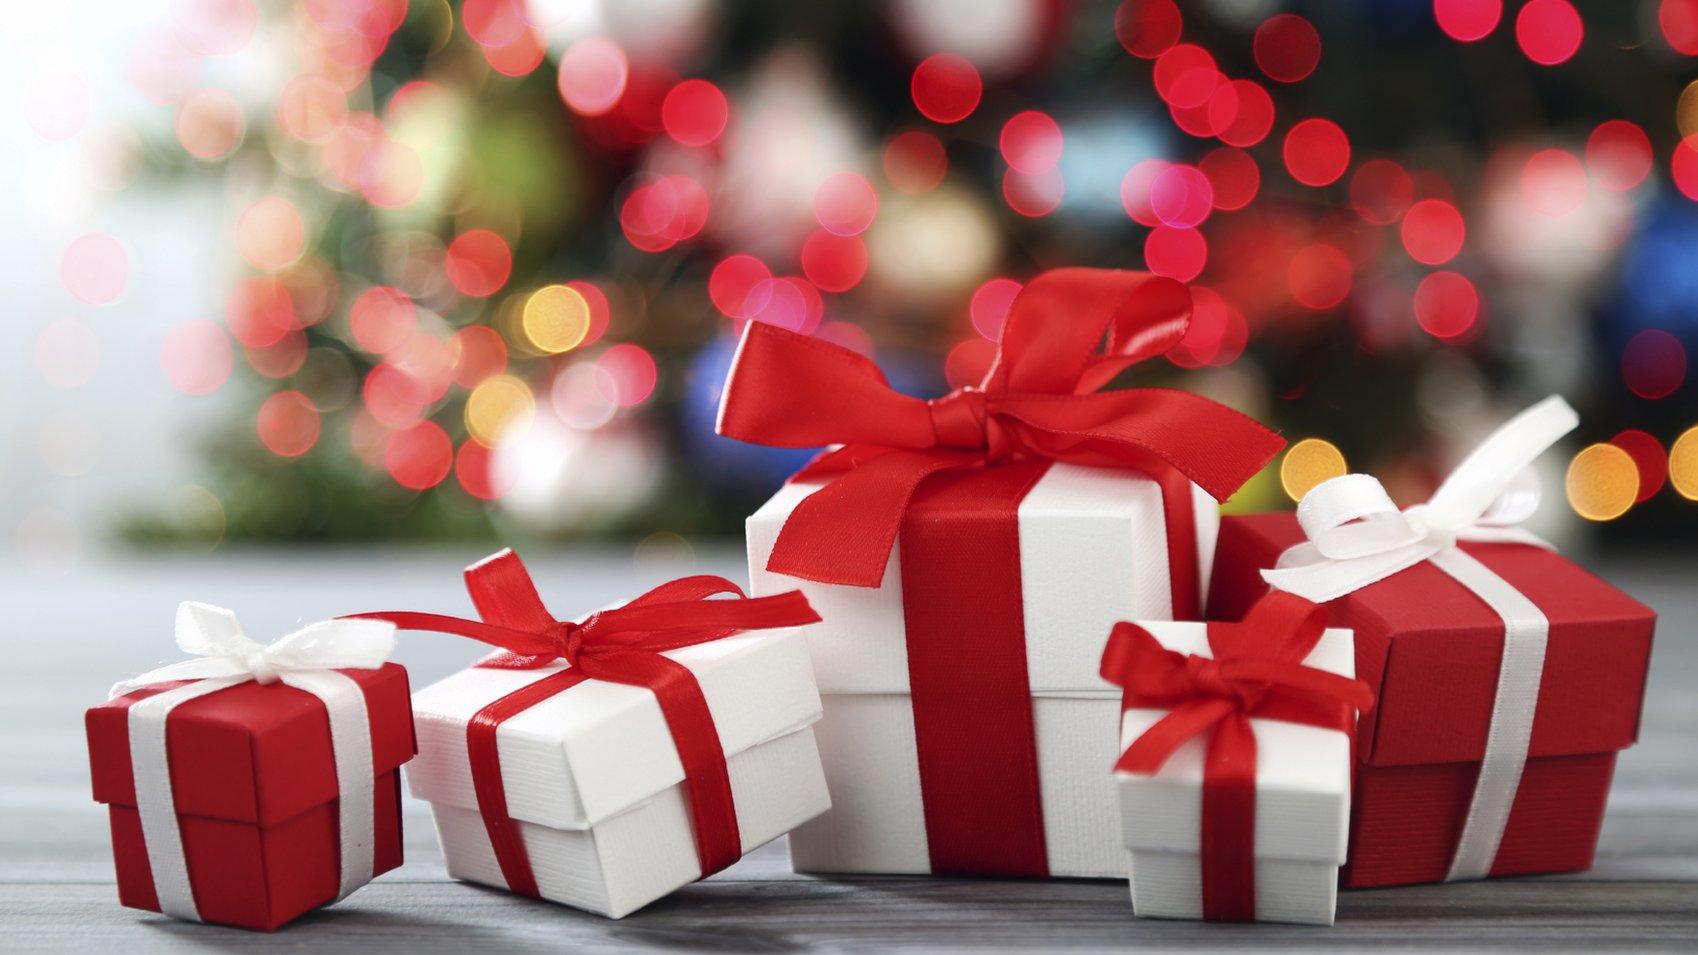 Christmas Eve Gift Box Santa Present Kids Children Favour Festive Decor Party